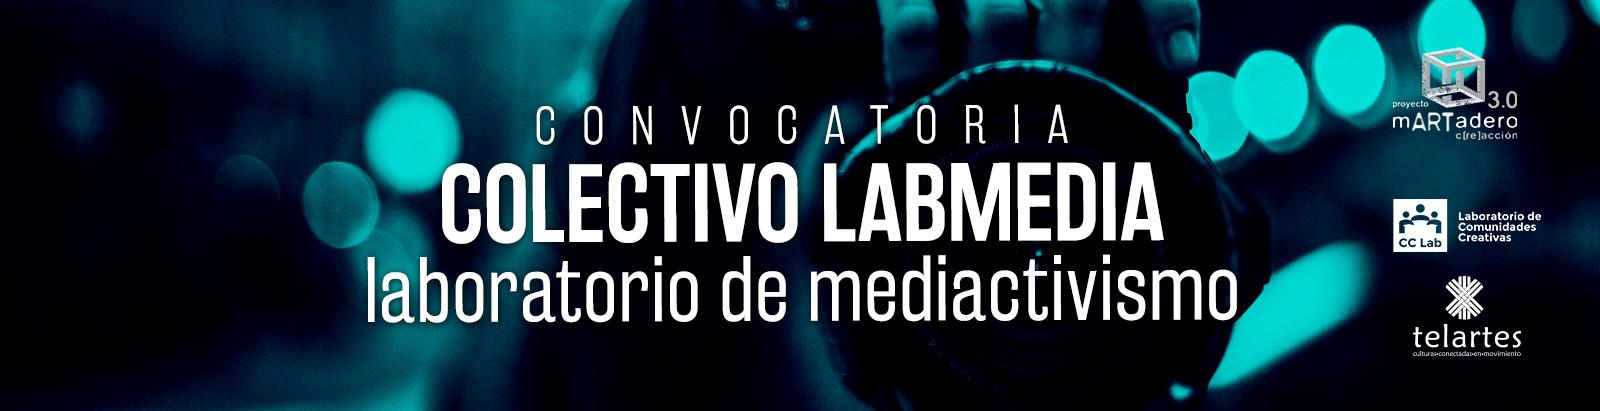 Convocatoria Colectivo Lab Media